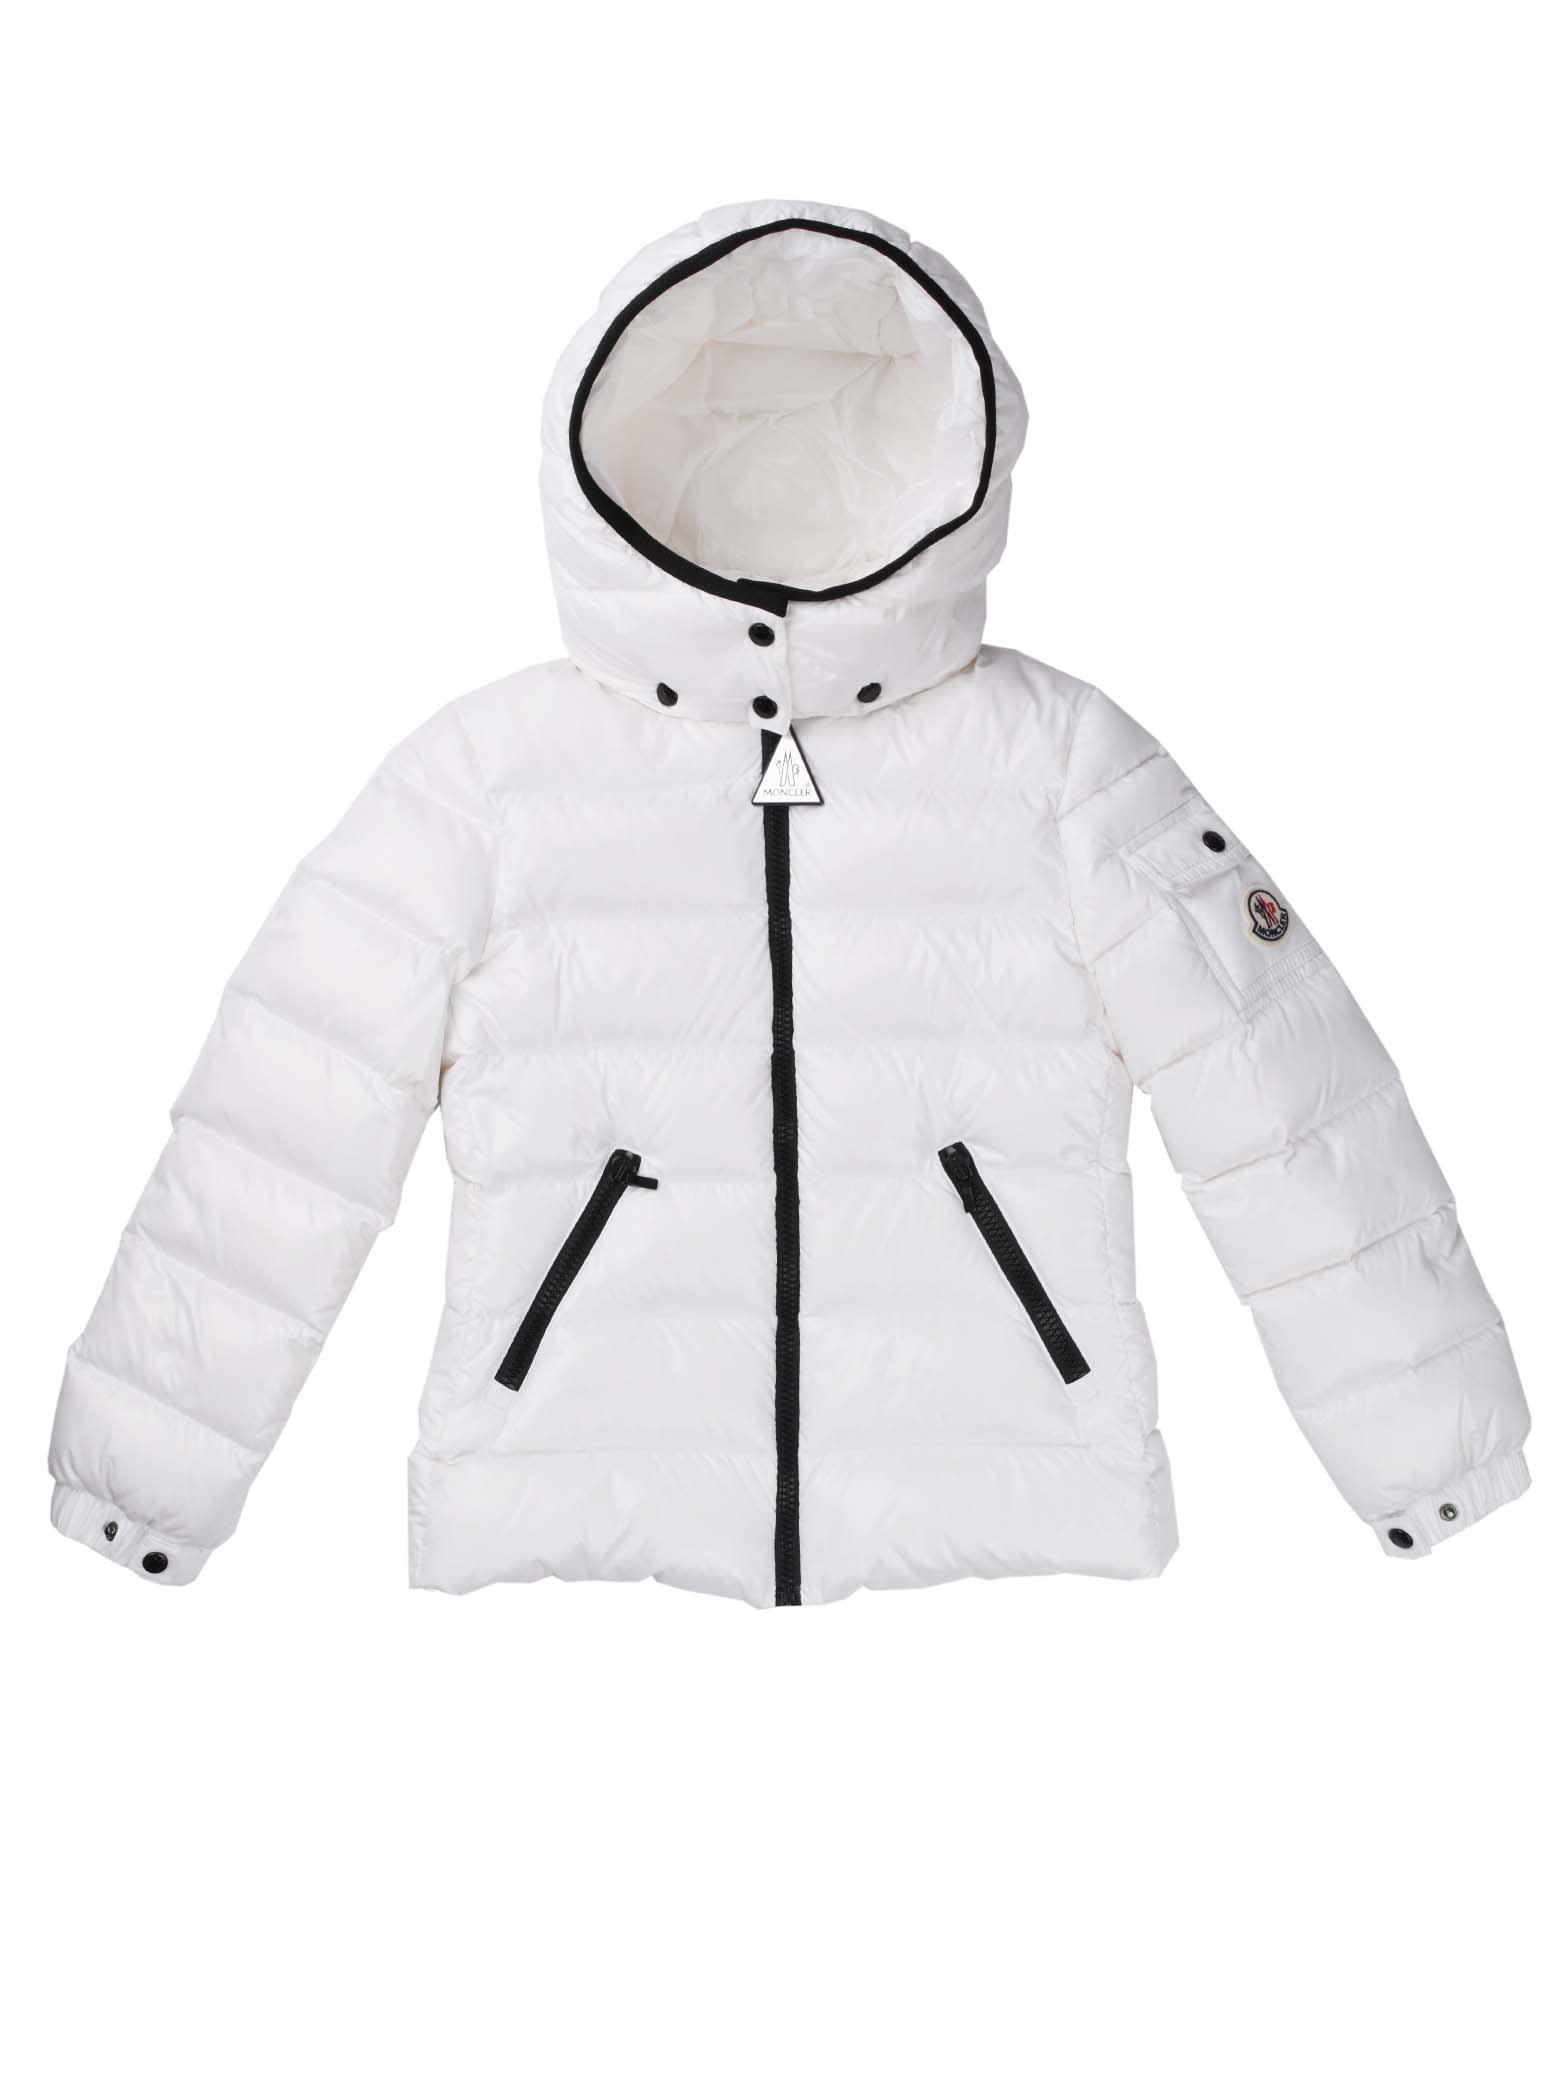 Moncler Bady White Jacket With Hood